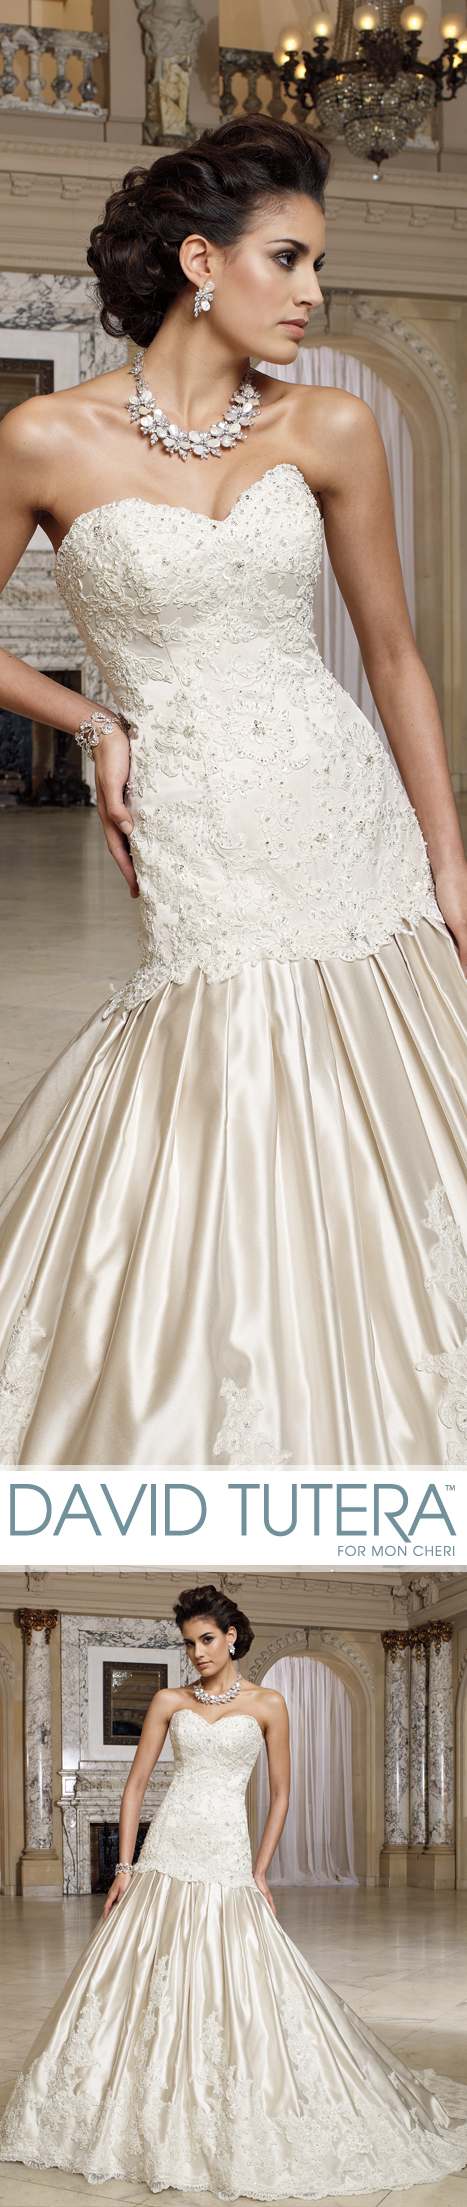 Dipped wedding dress  Wedding Dresses  u Spring   Wedding dress David tutera and